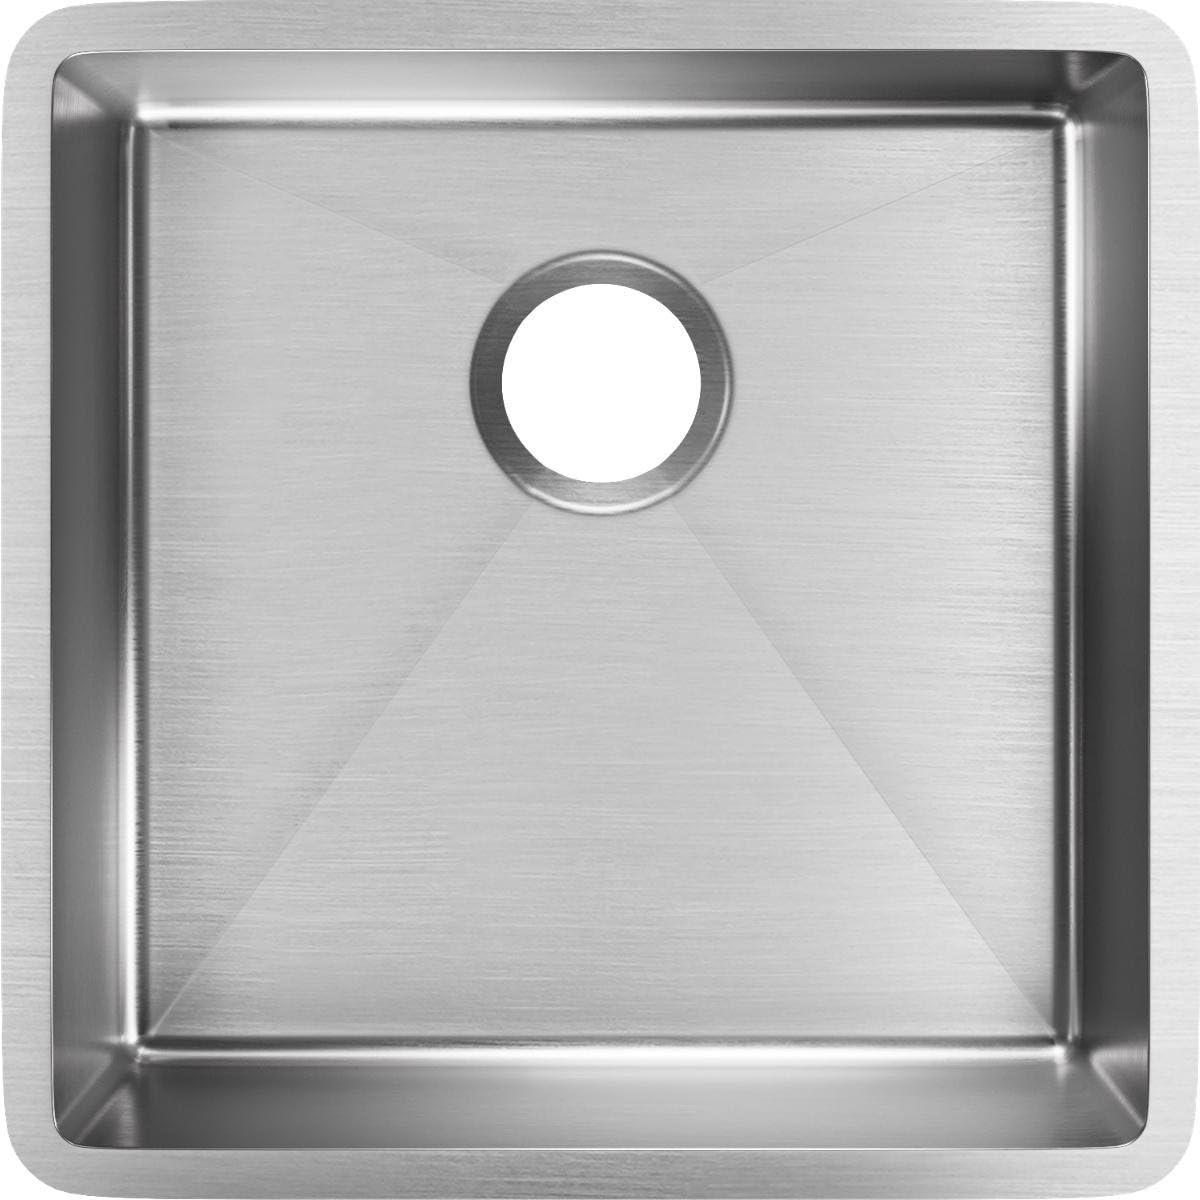 Elkay ECTRU17179T Crosstown Single Bowl Undermount Stainless Steel Sink